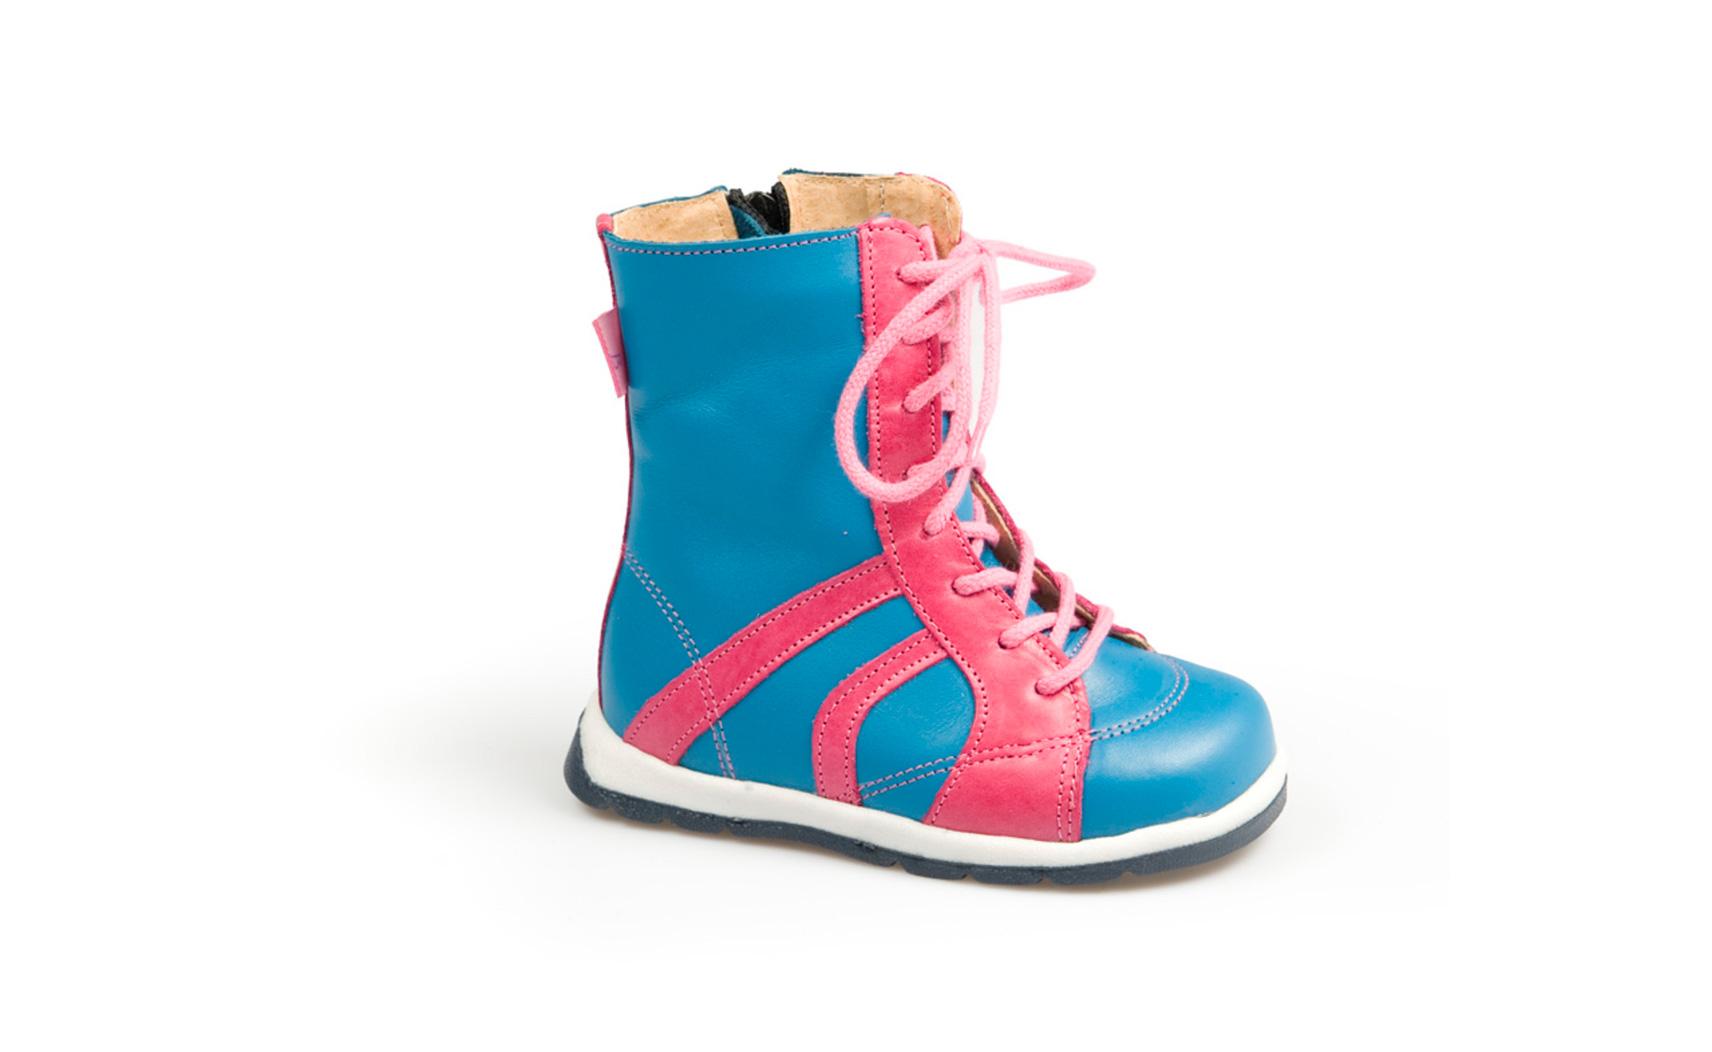 6fb8d29ffb3a Ortopedická obuv Aurelka